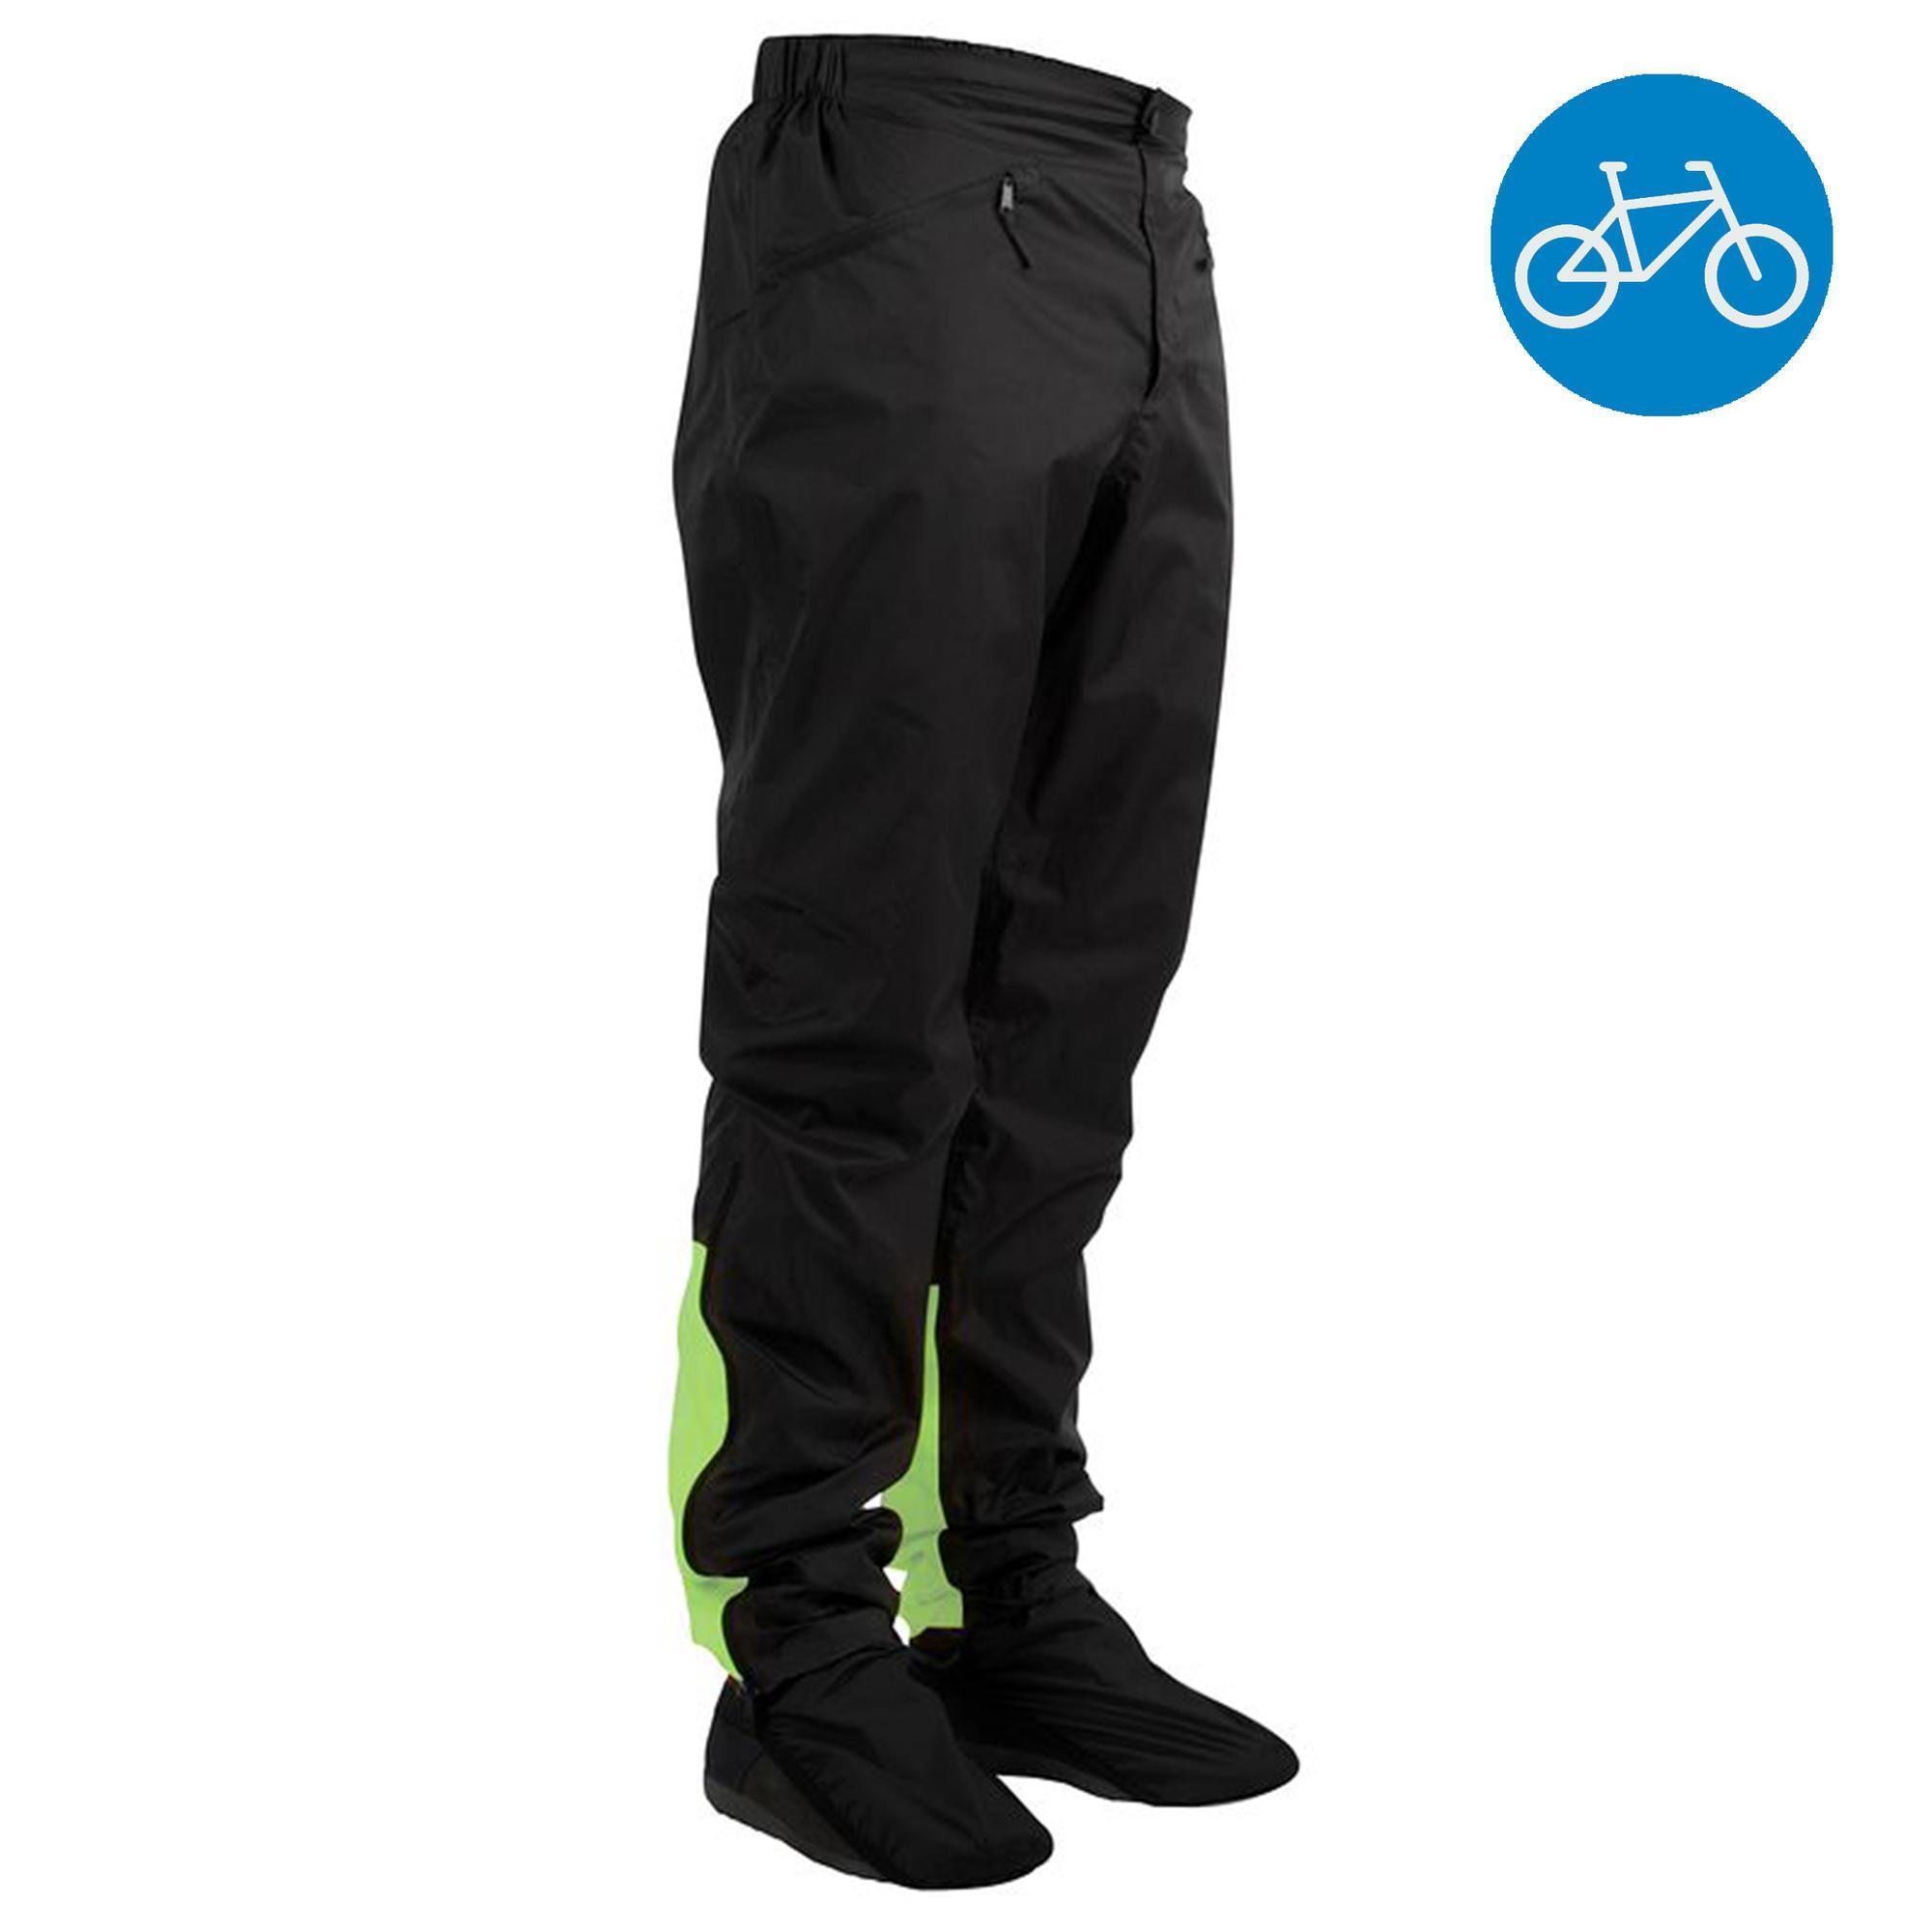 pantalon de pluie vélo